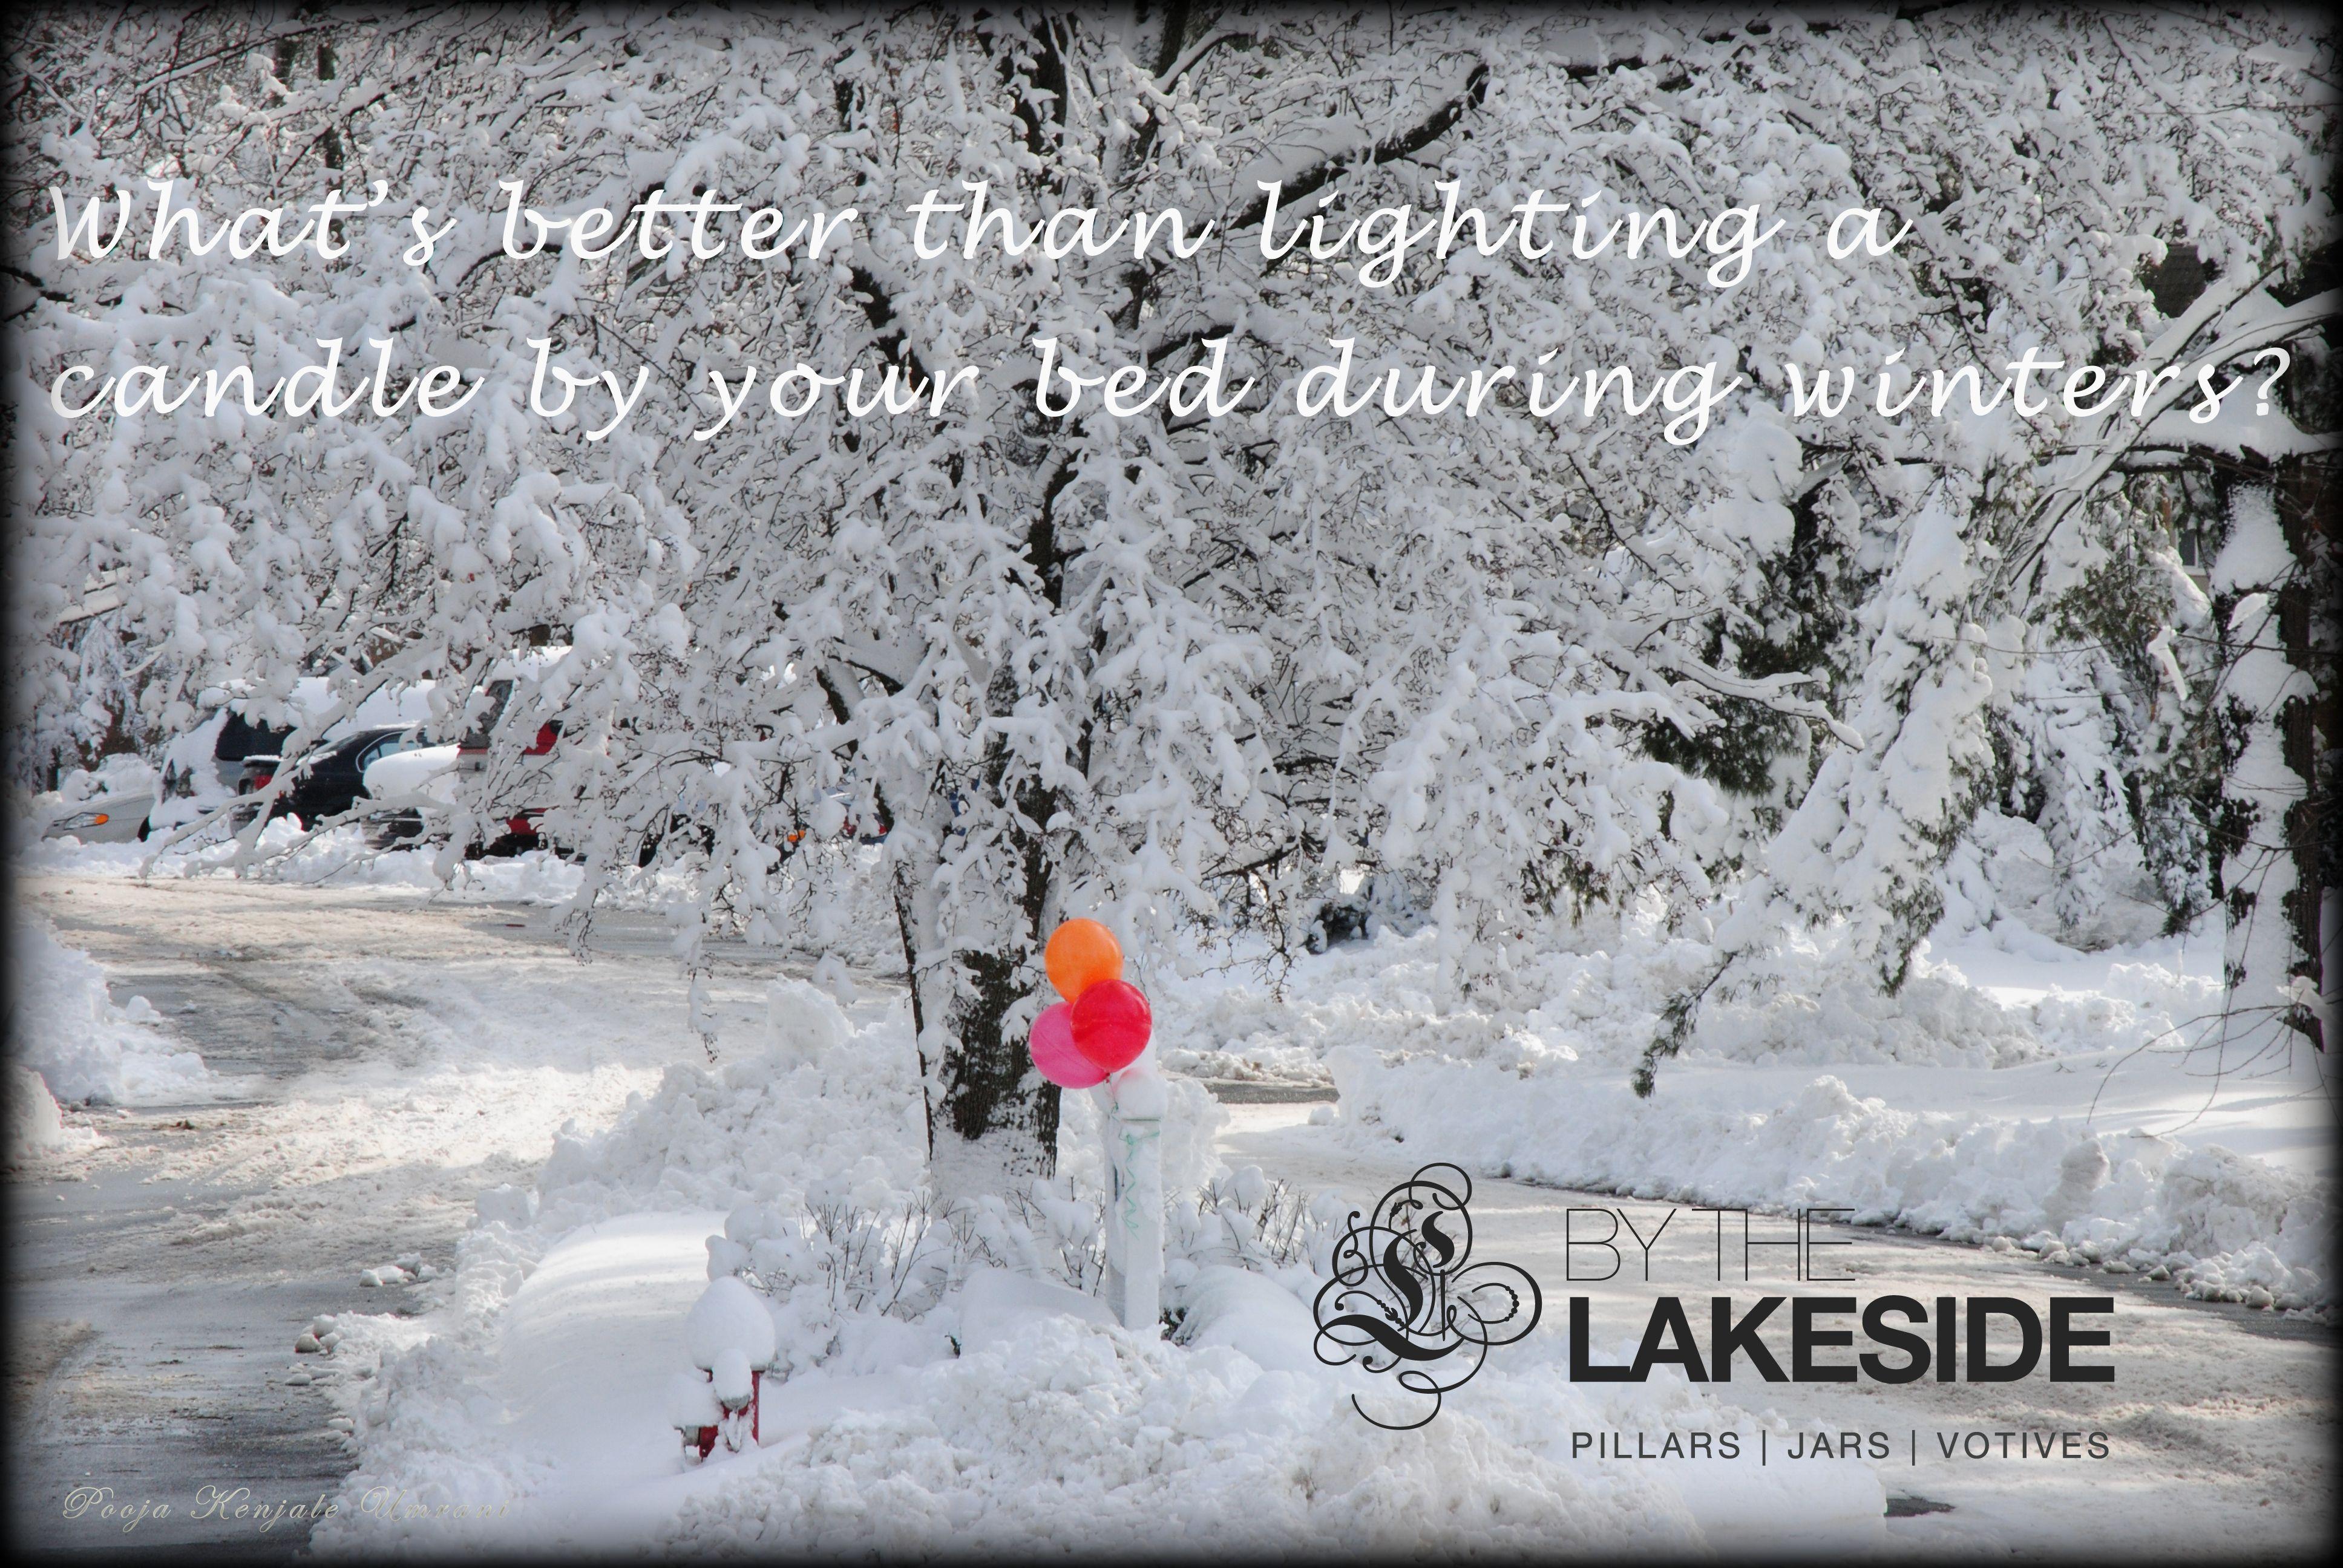 #ByTheLakeside for #Winters